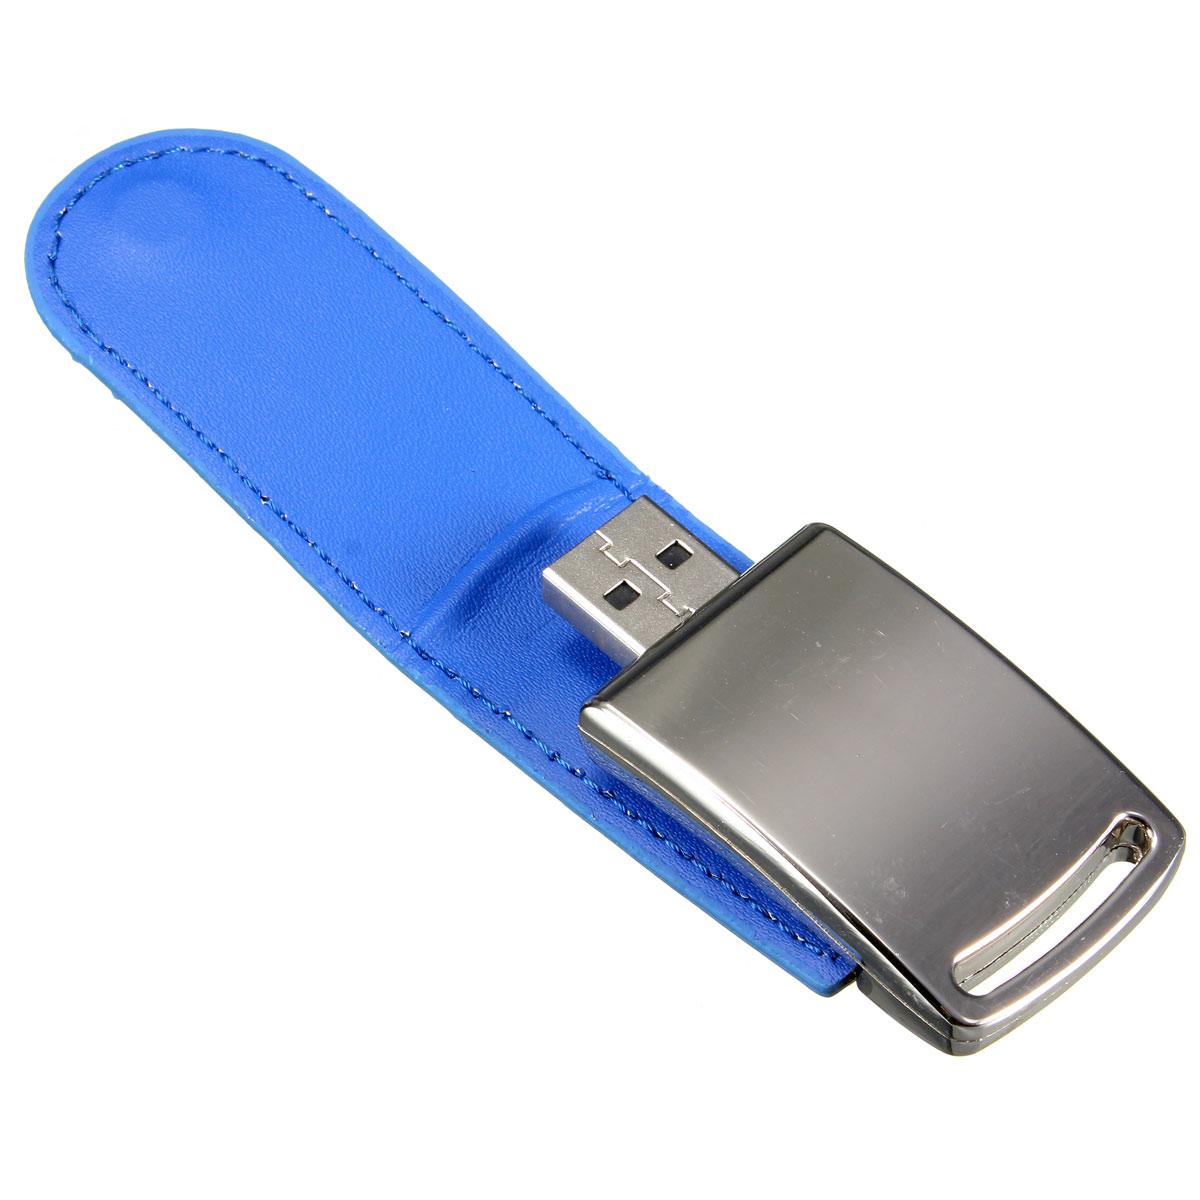 8gb portable mini leather metal silver usb2 0 flash stick. Black Bedroom Furniture Sets. Home Design Ideas